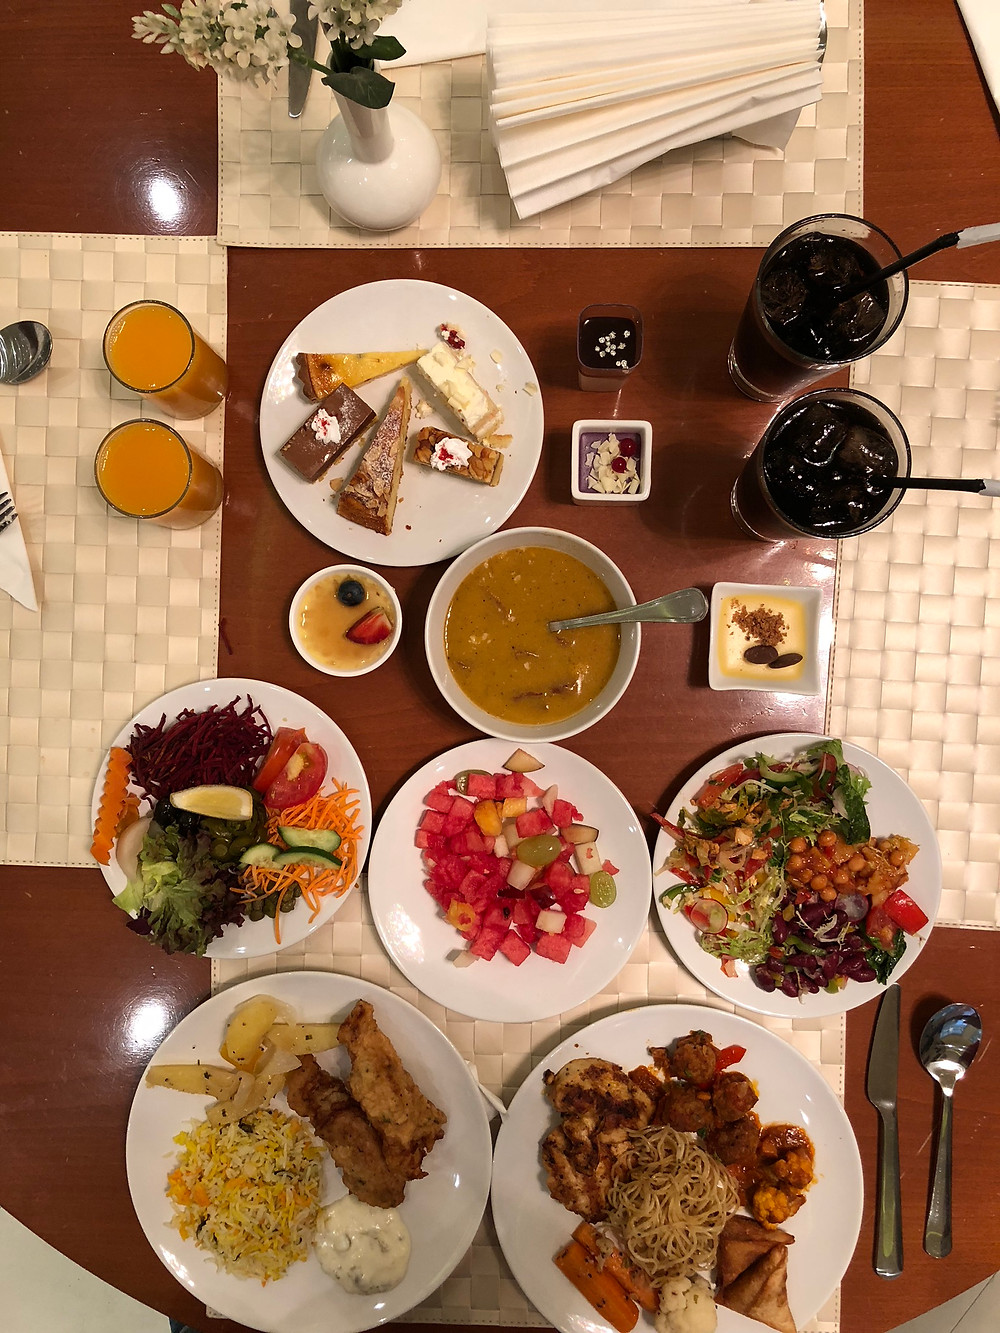 Restaurant in Ras Al Khaimah